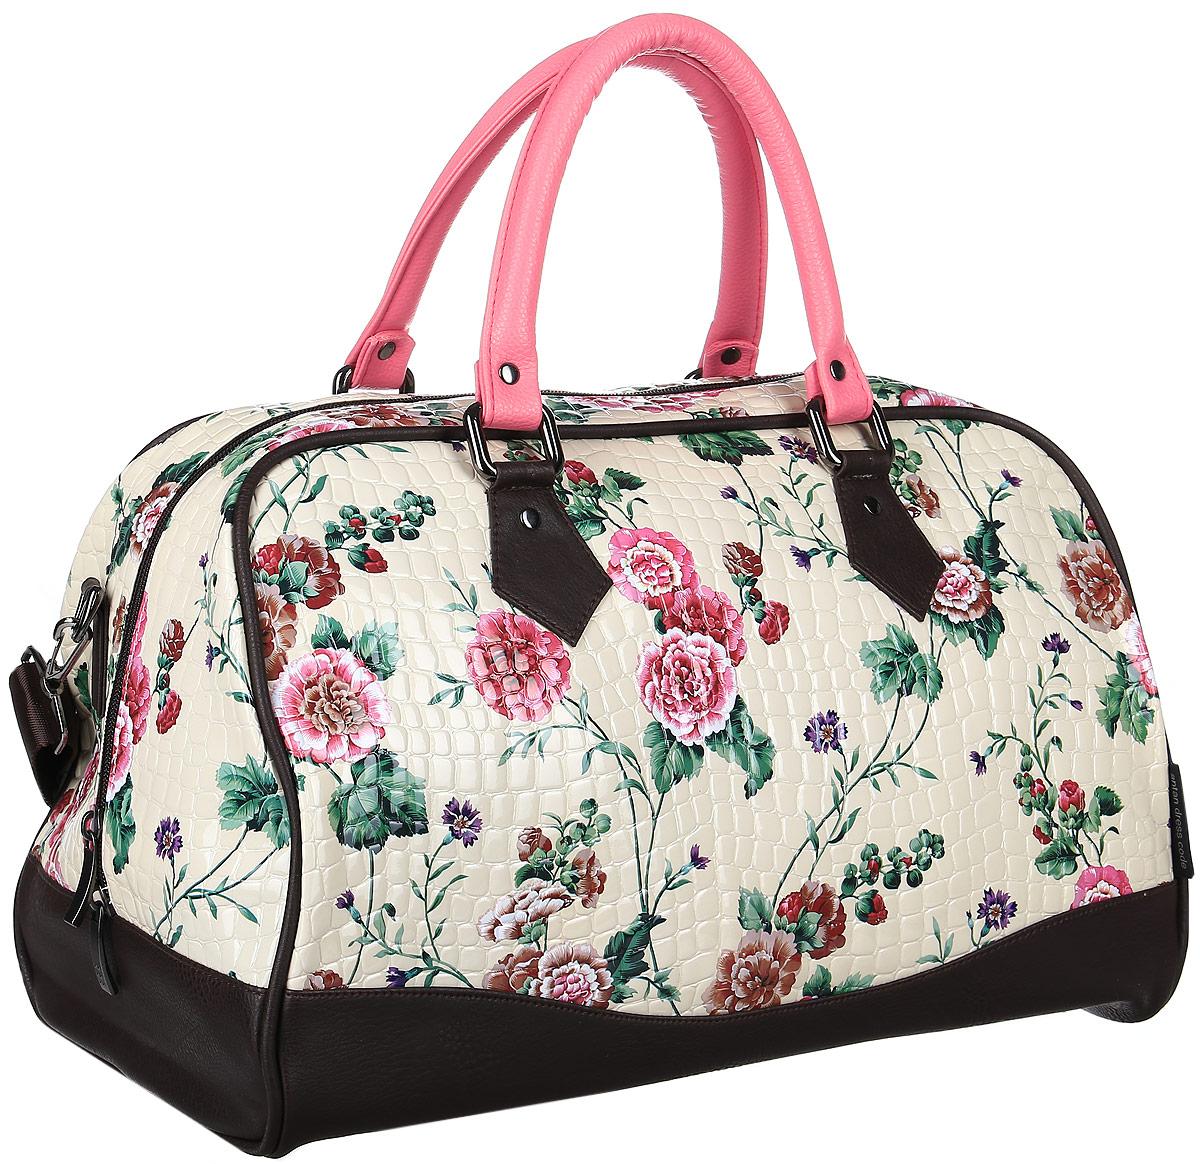 Сумка дорожная женская Аntan, цвет: бежевый, розовый. 4670018861526